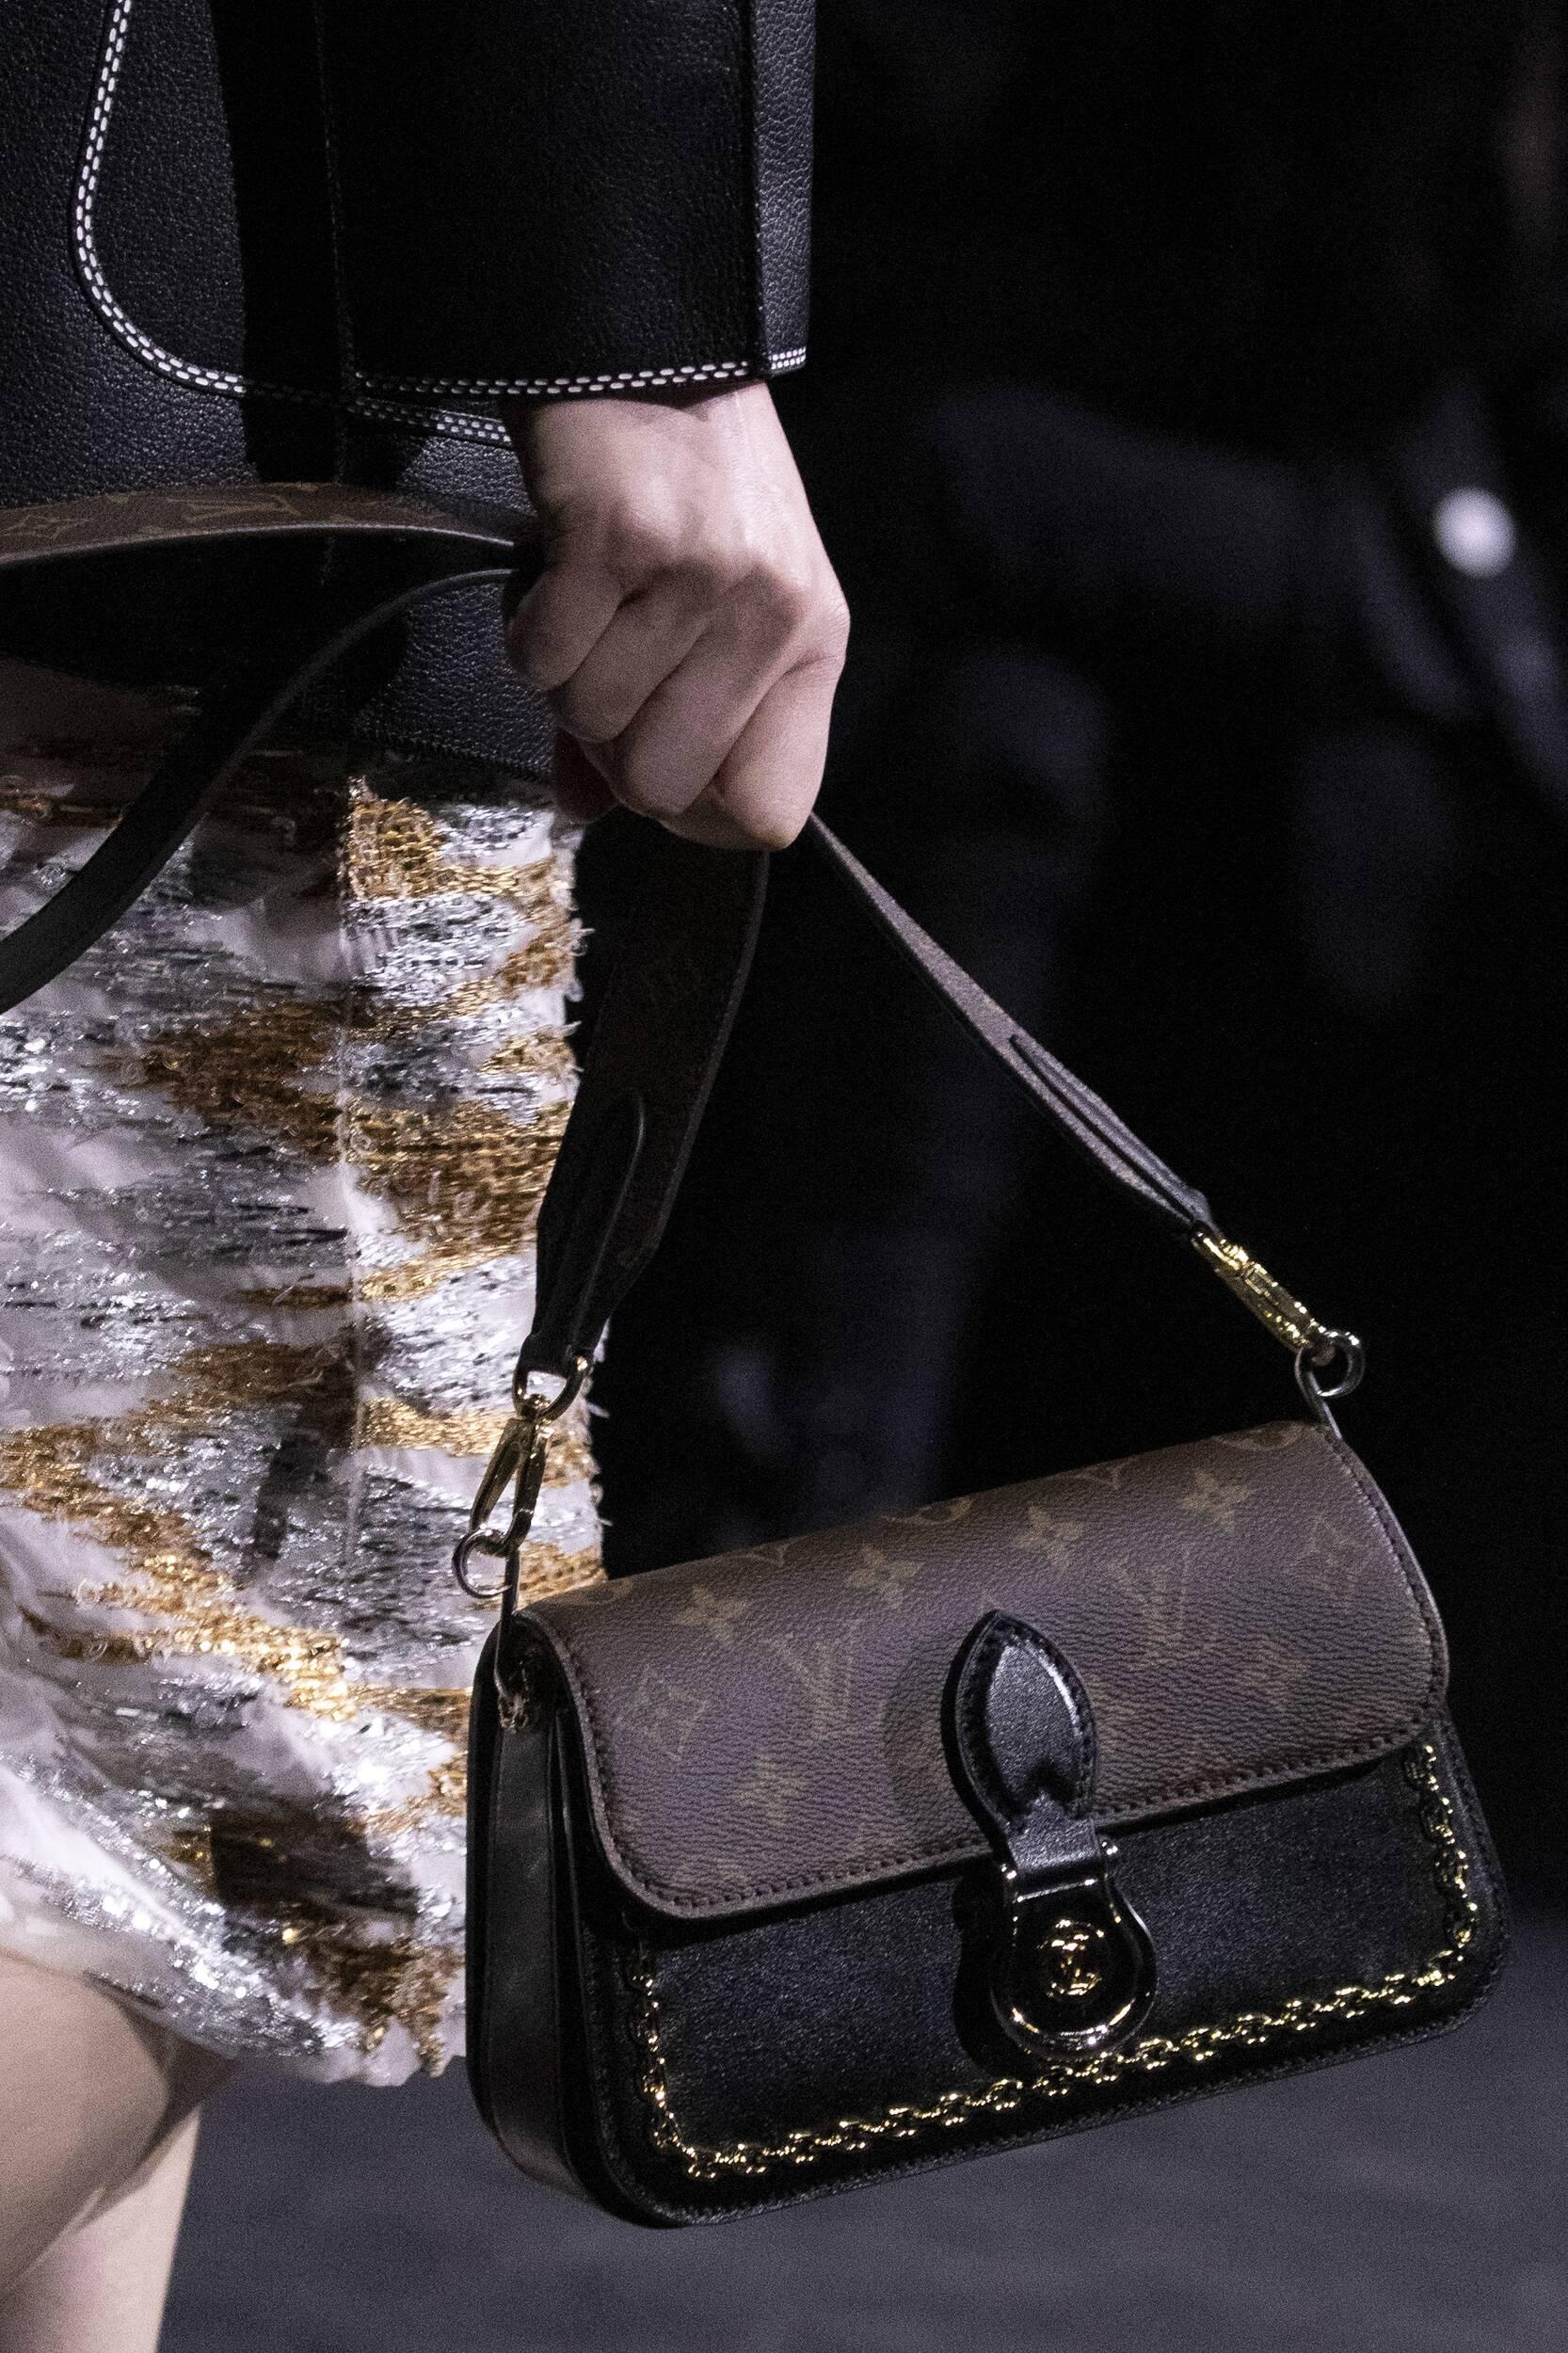 Louis Vuitton Paris Fashion Week Handbag Detail